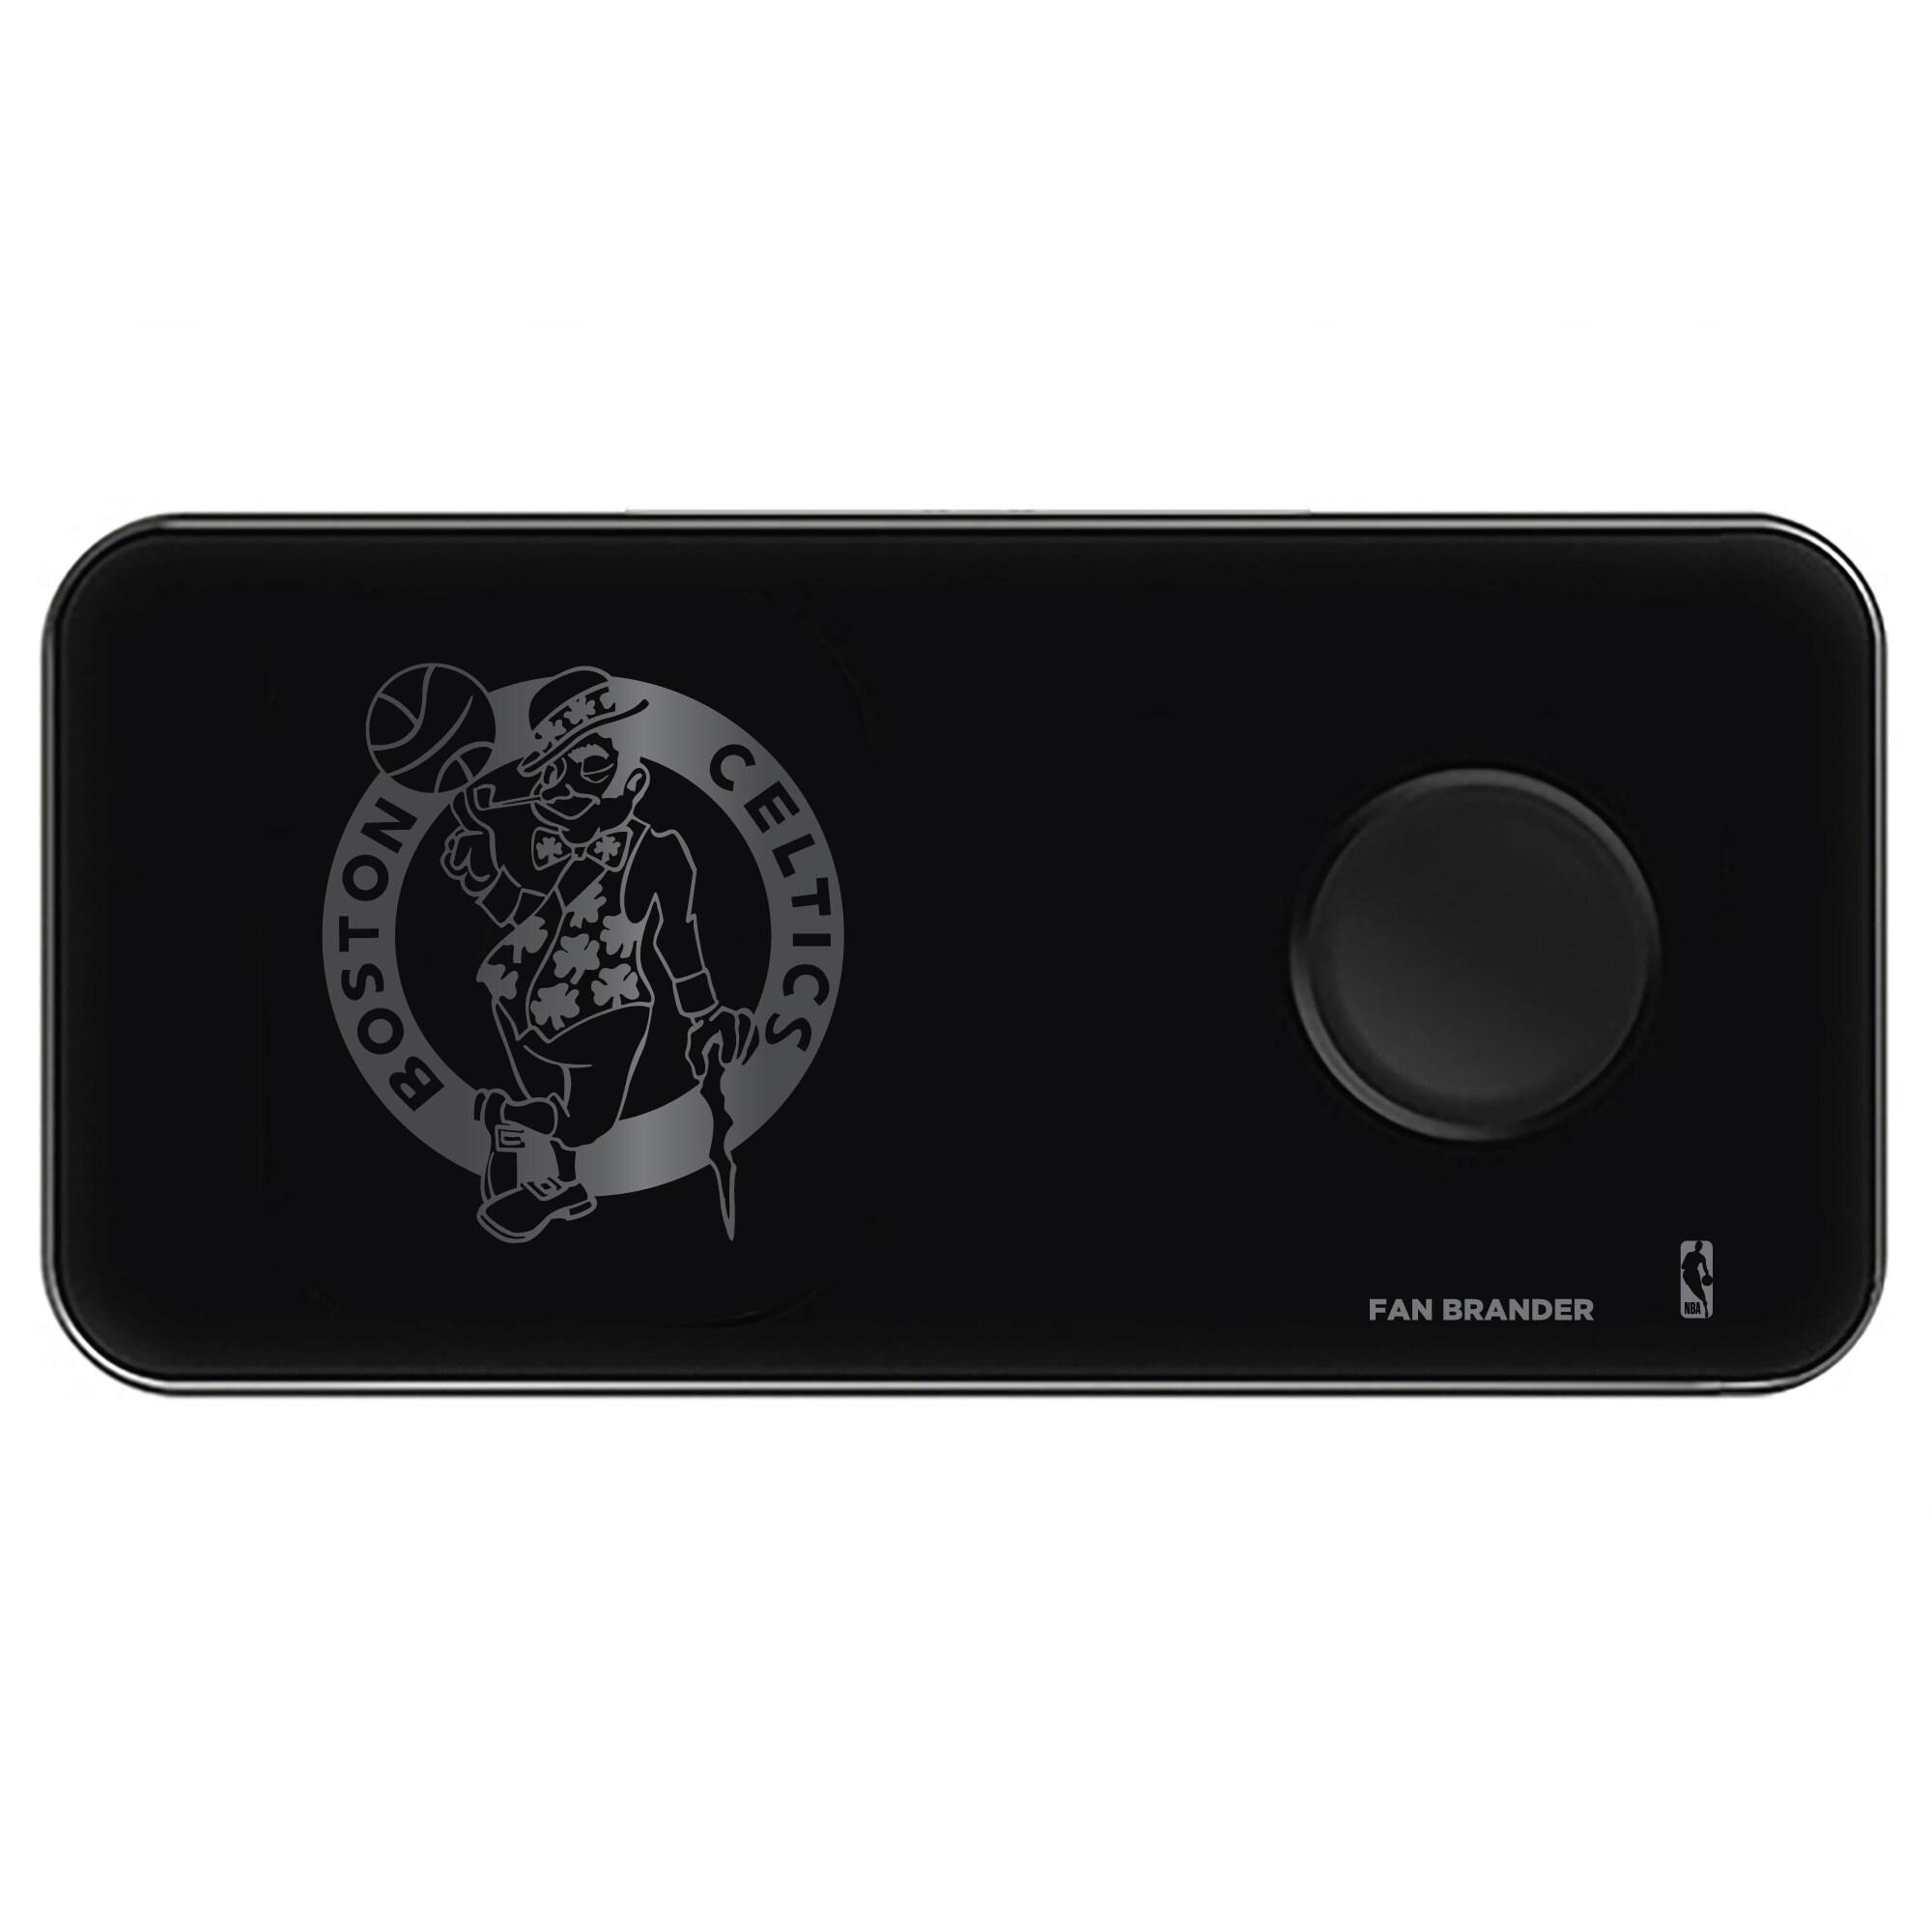 Boston Celtics 3-in-1 Glass Wireless Charge Pad - Black